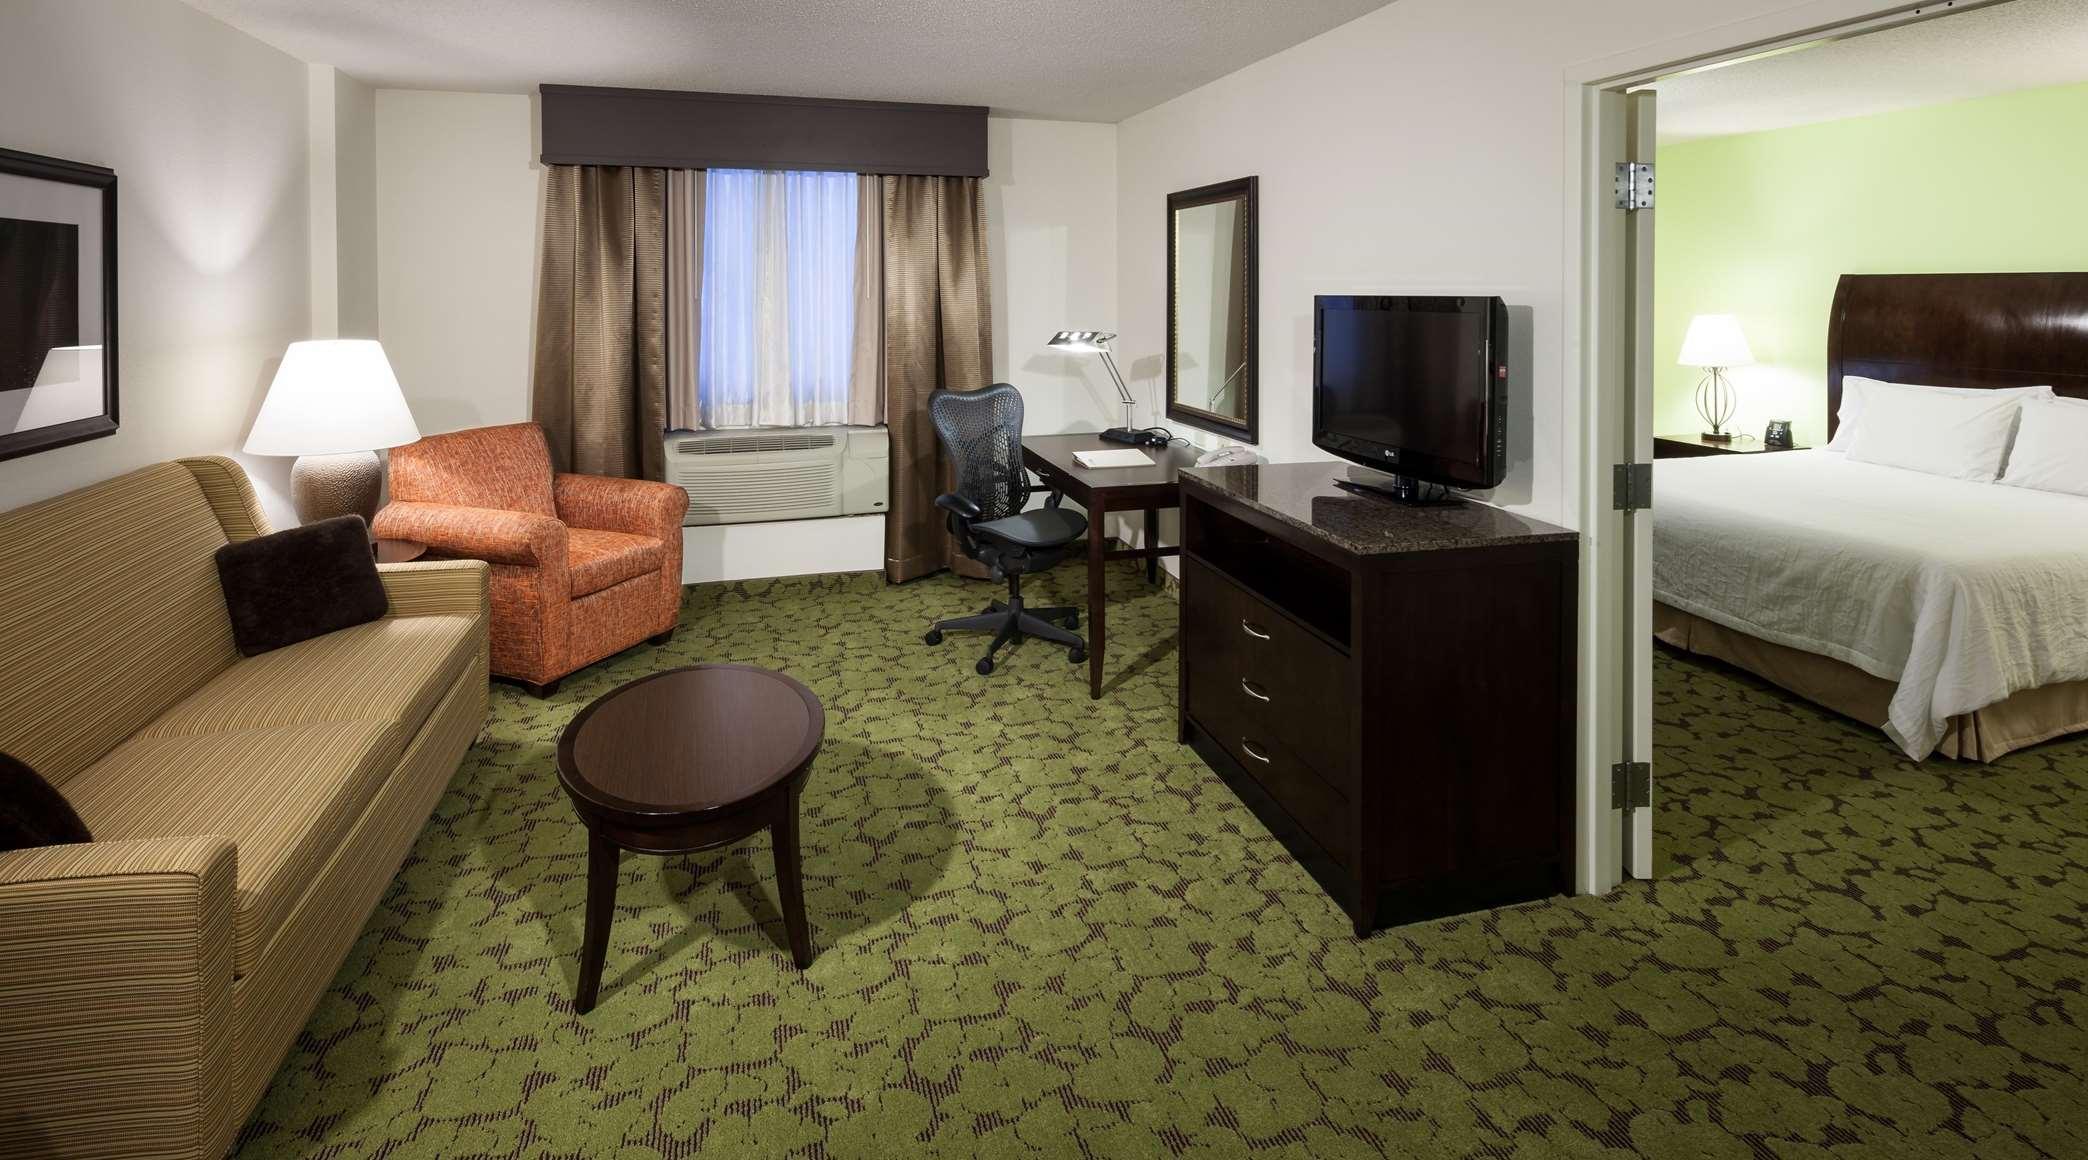 Hilton Garden Inn Denver/Highlands Ranch image 32